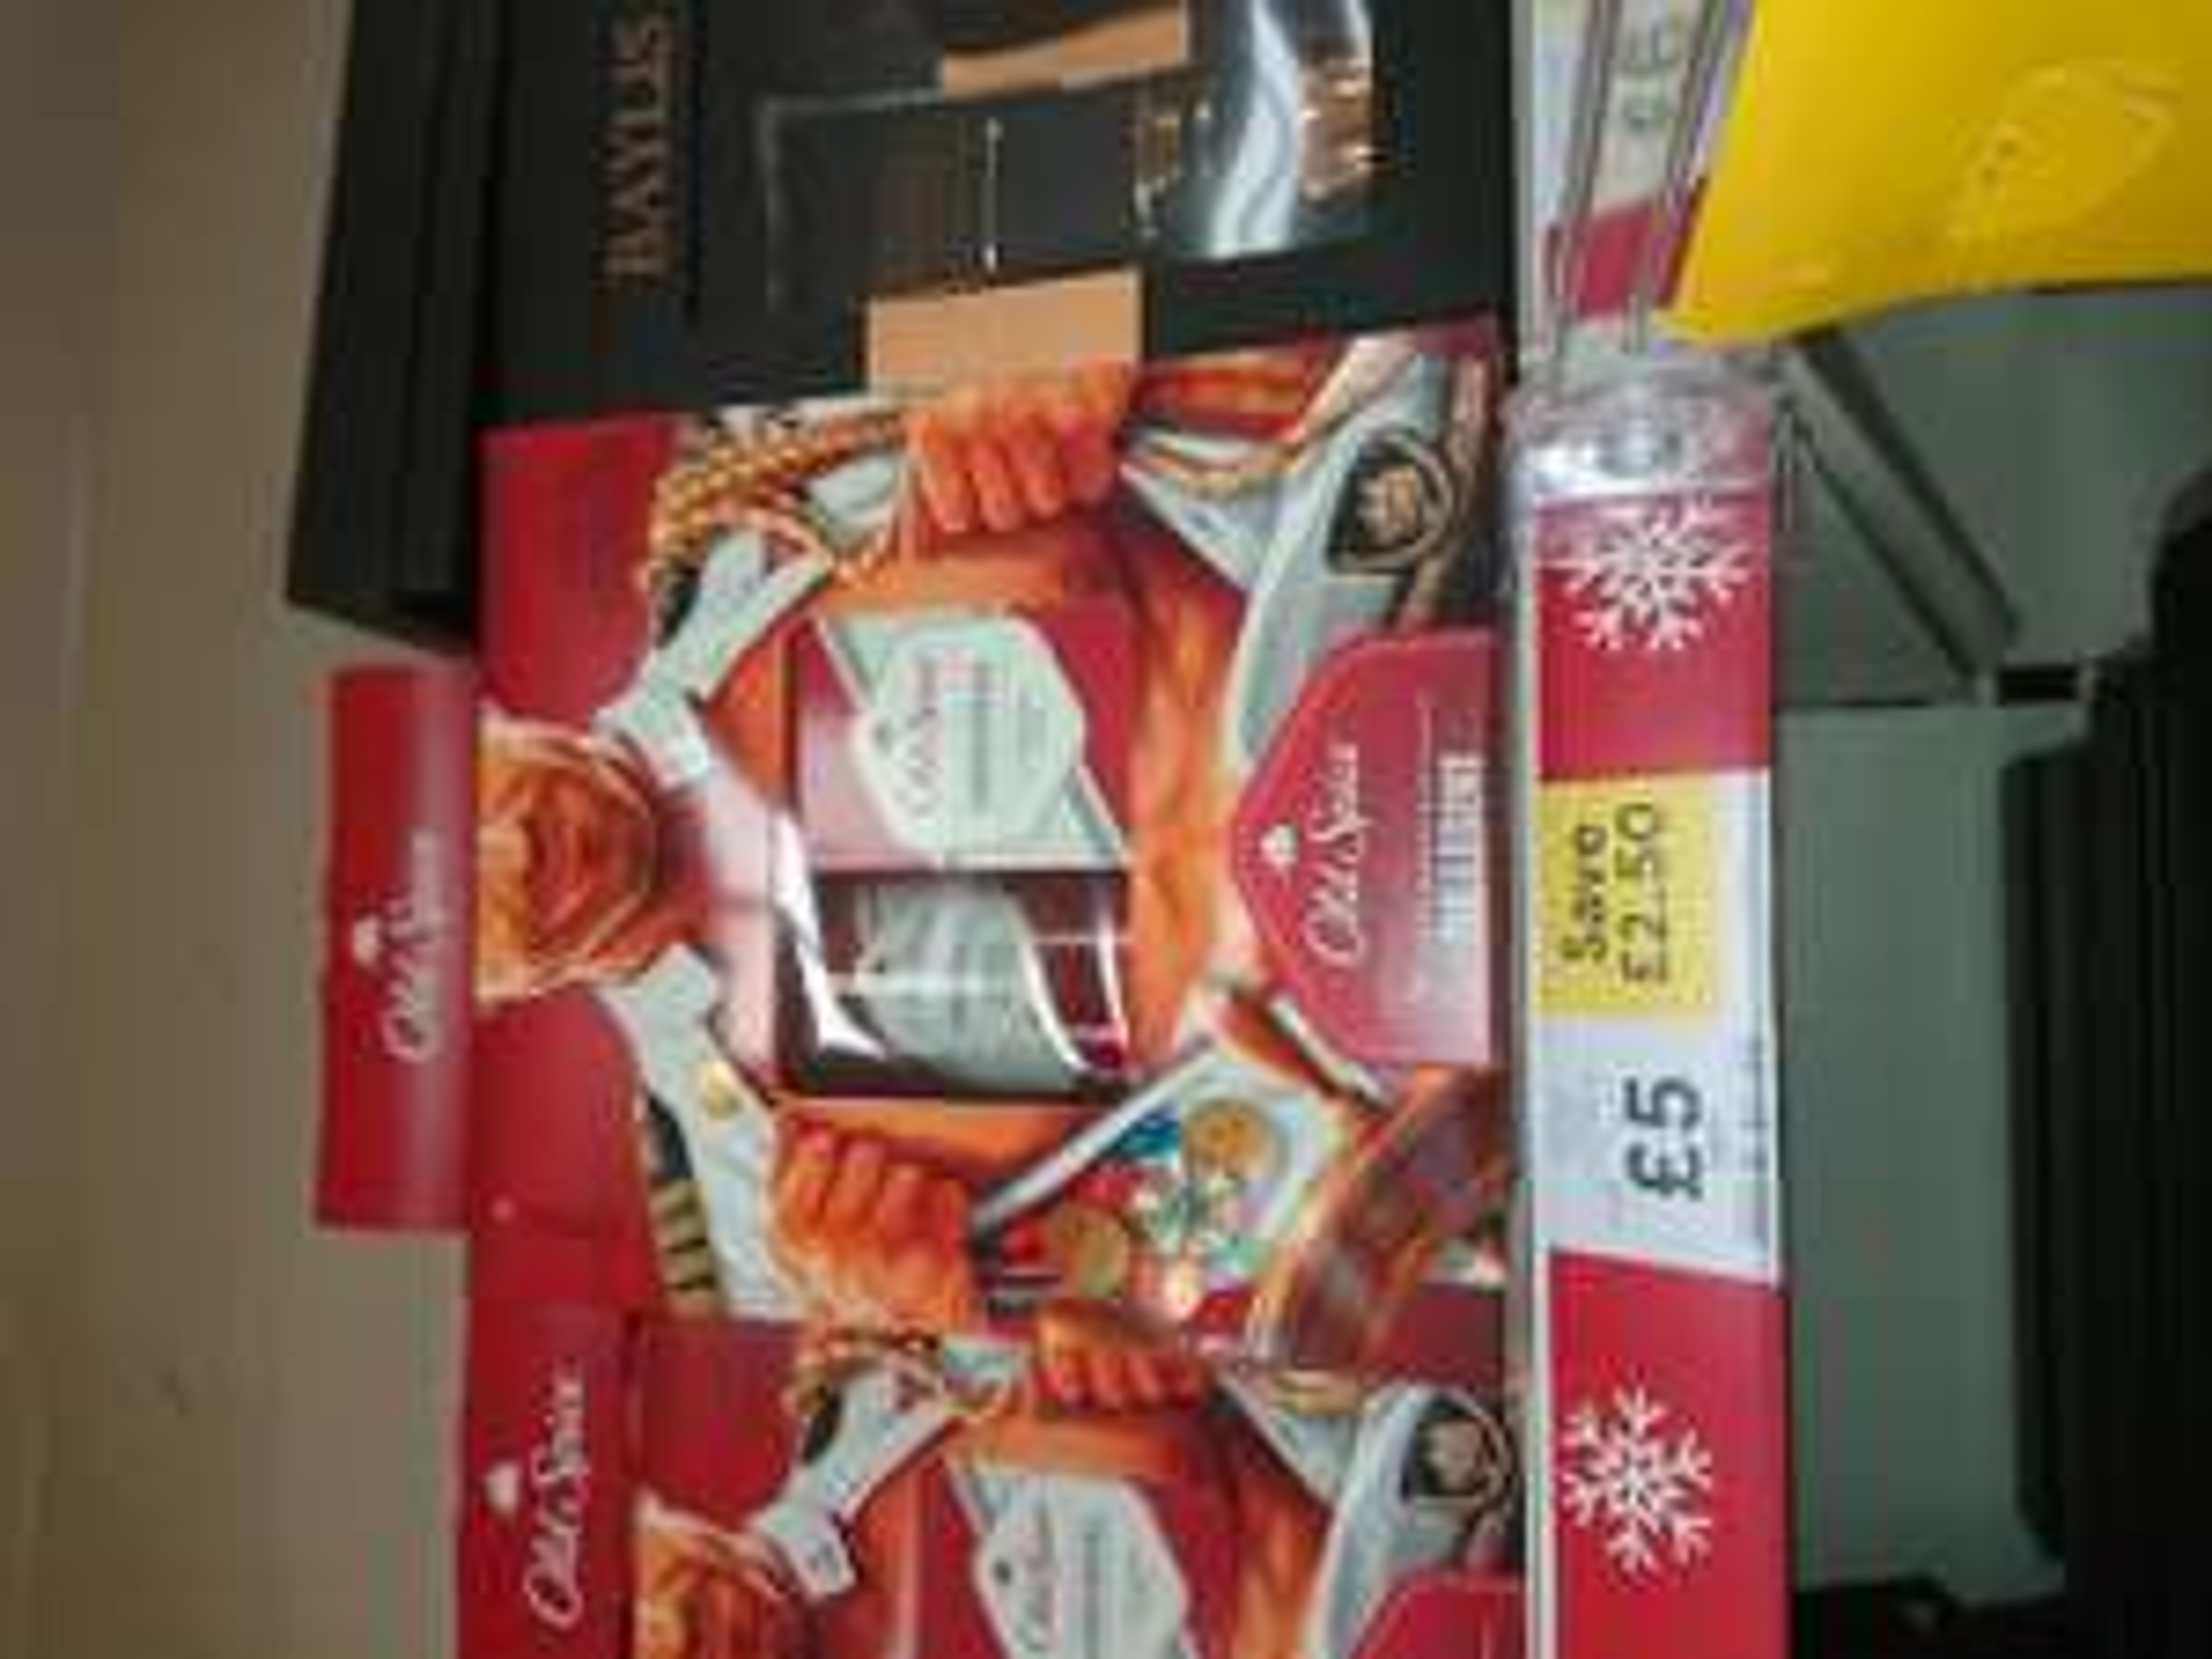 Old Spice gift set £5 instore @ tesco